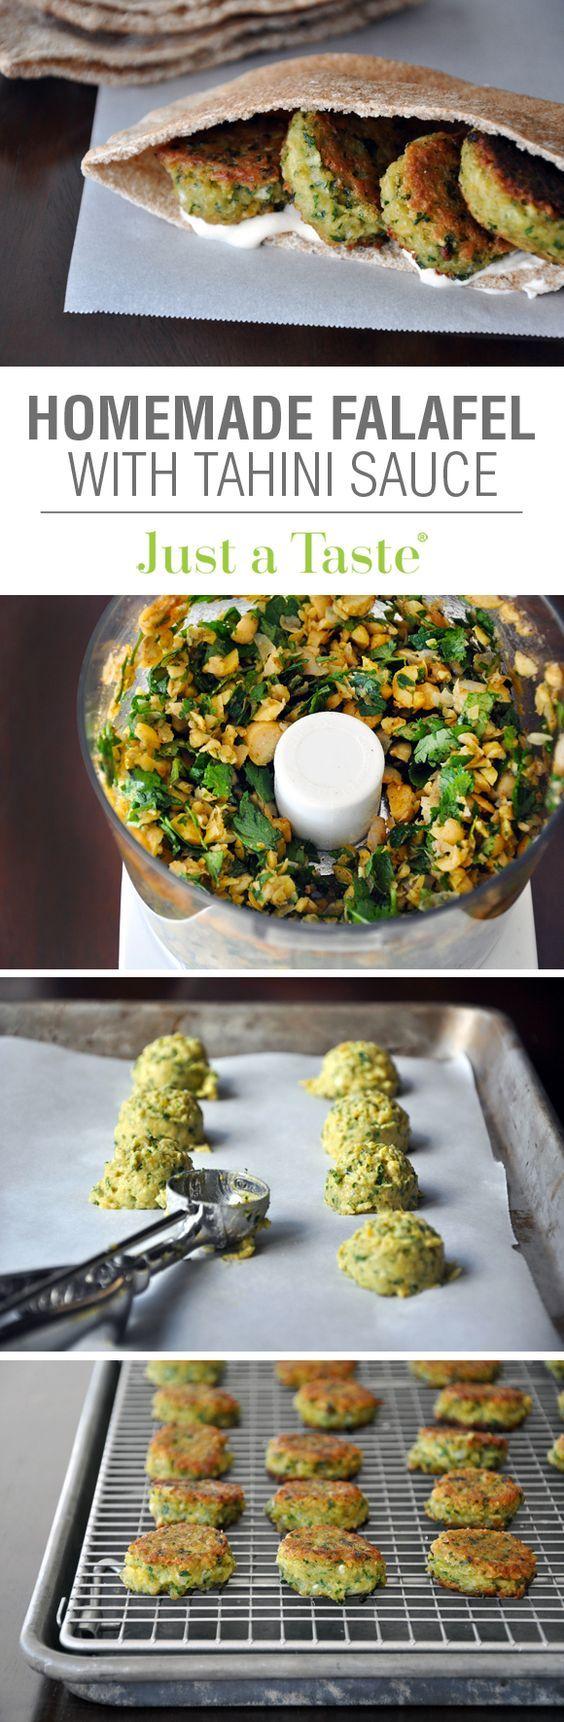 Homemade Falafel with Tahini Sauce #recipe from justataste.com